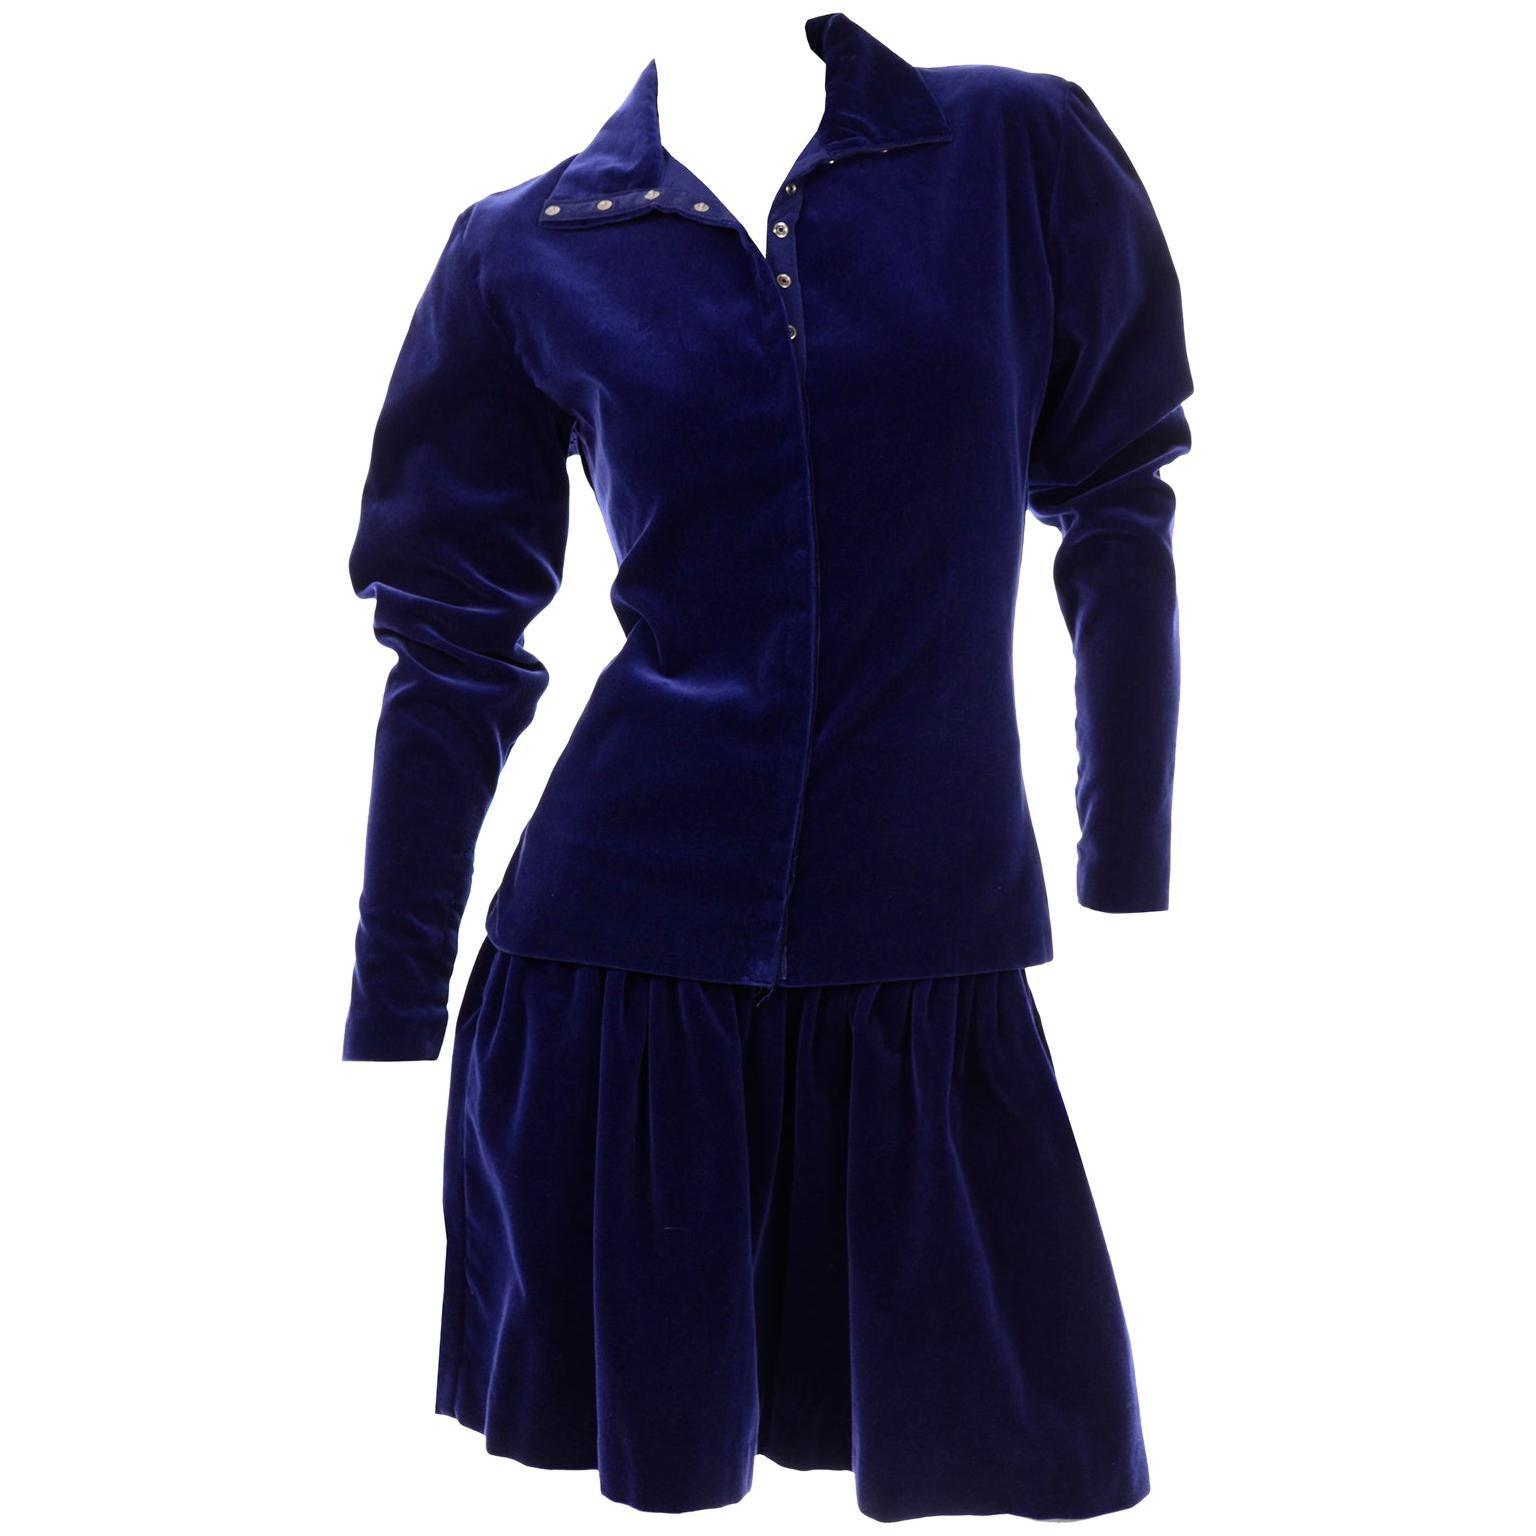 Blue Velvet Vintage Norma Kamali Sweatshirt Style Evening Skirt & Top w Snaps